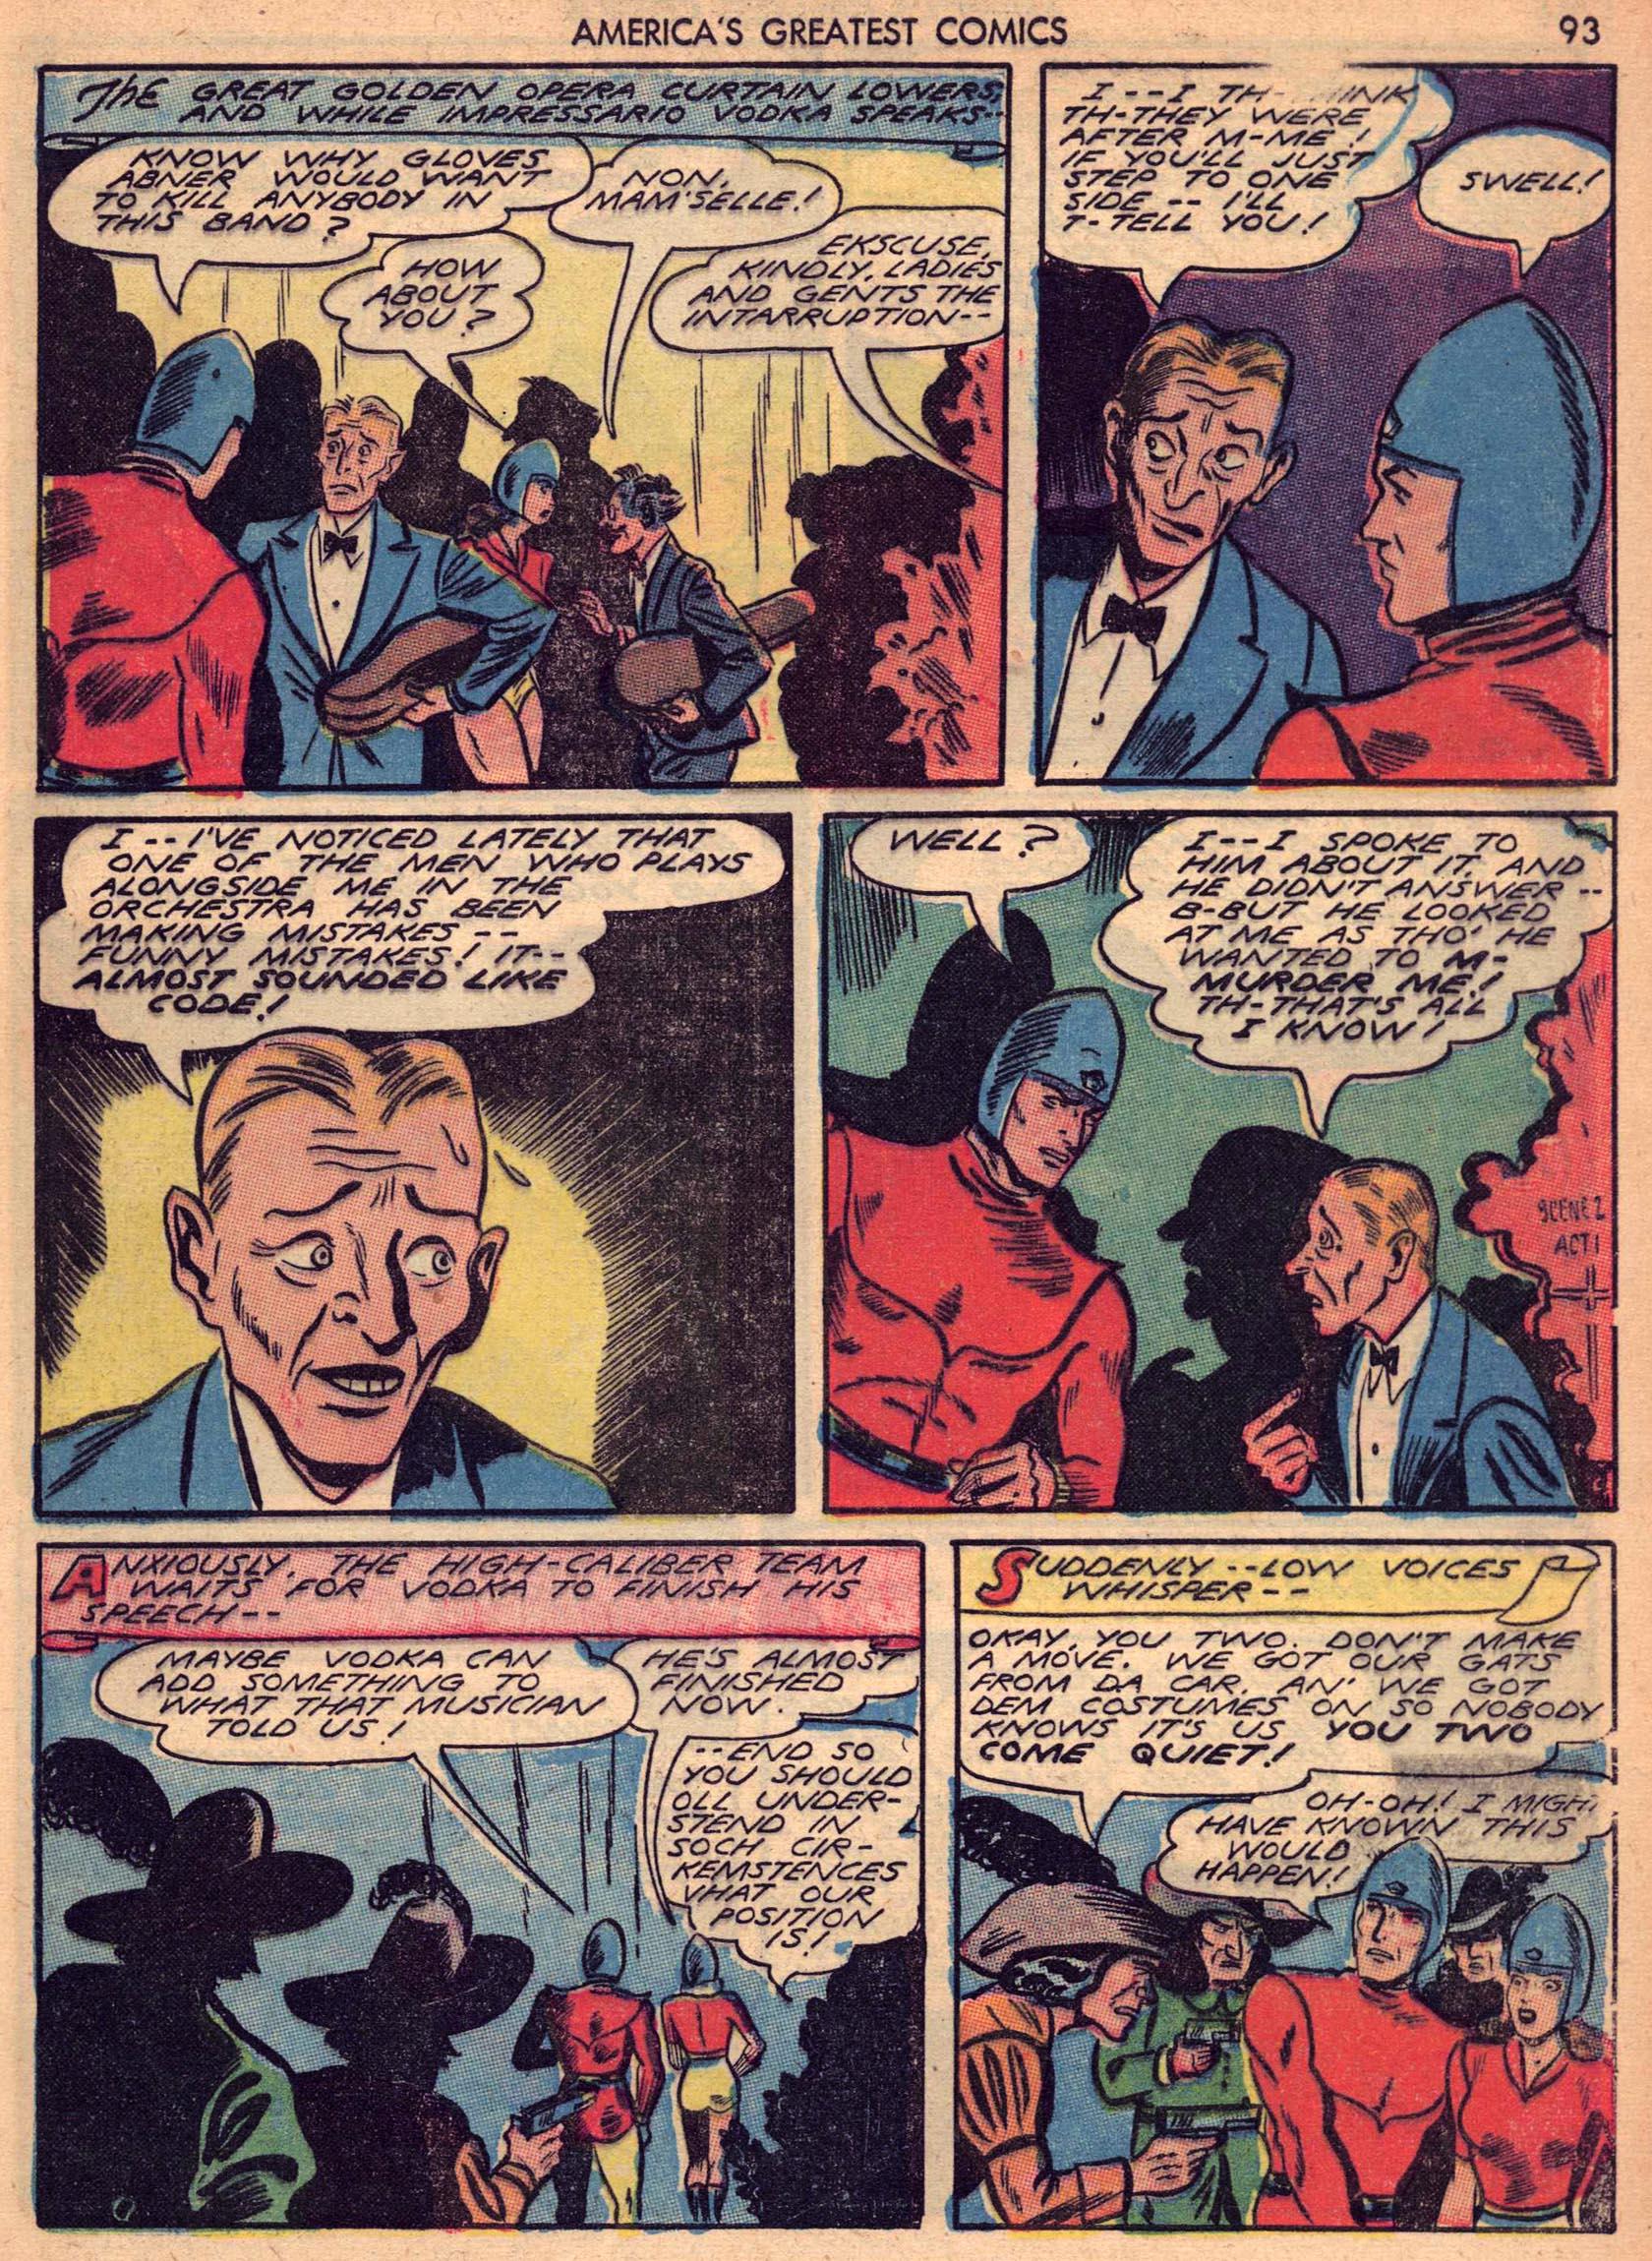 Read online America's Greatest Comics comic -  Issue #7 - 92